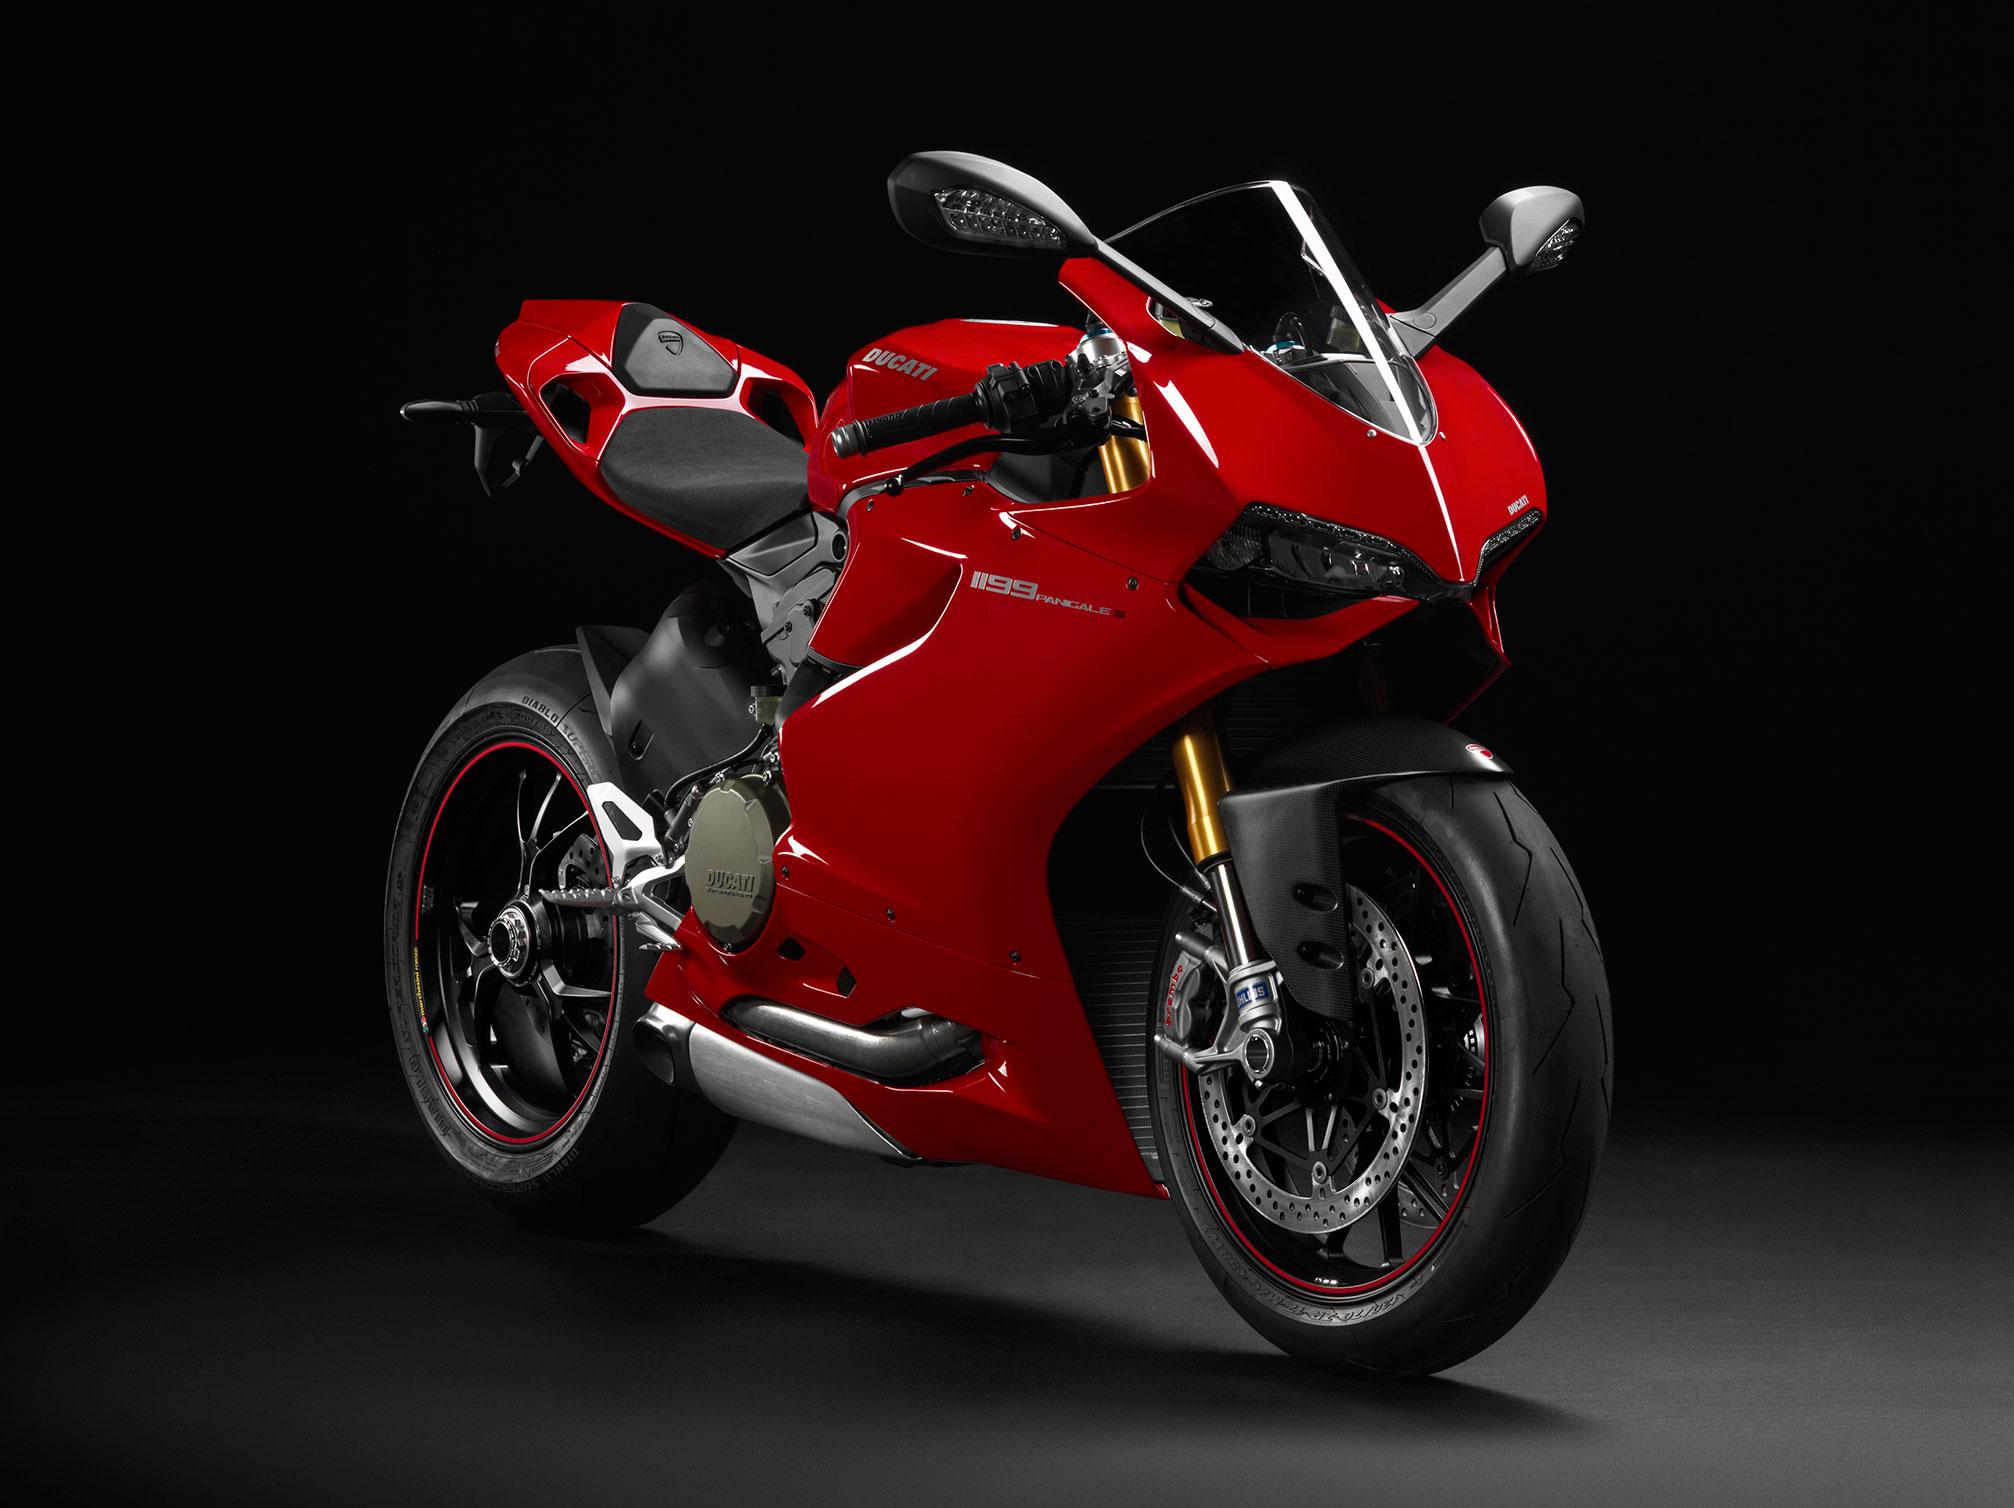 Ducati 899 Panigale Wallpaper 2014x1508